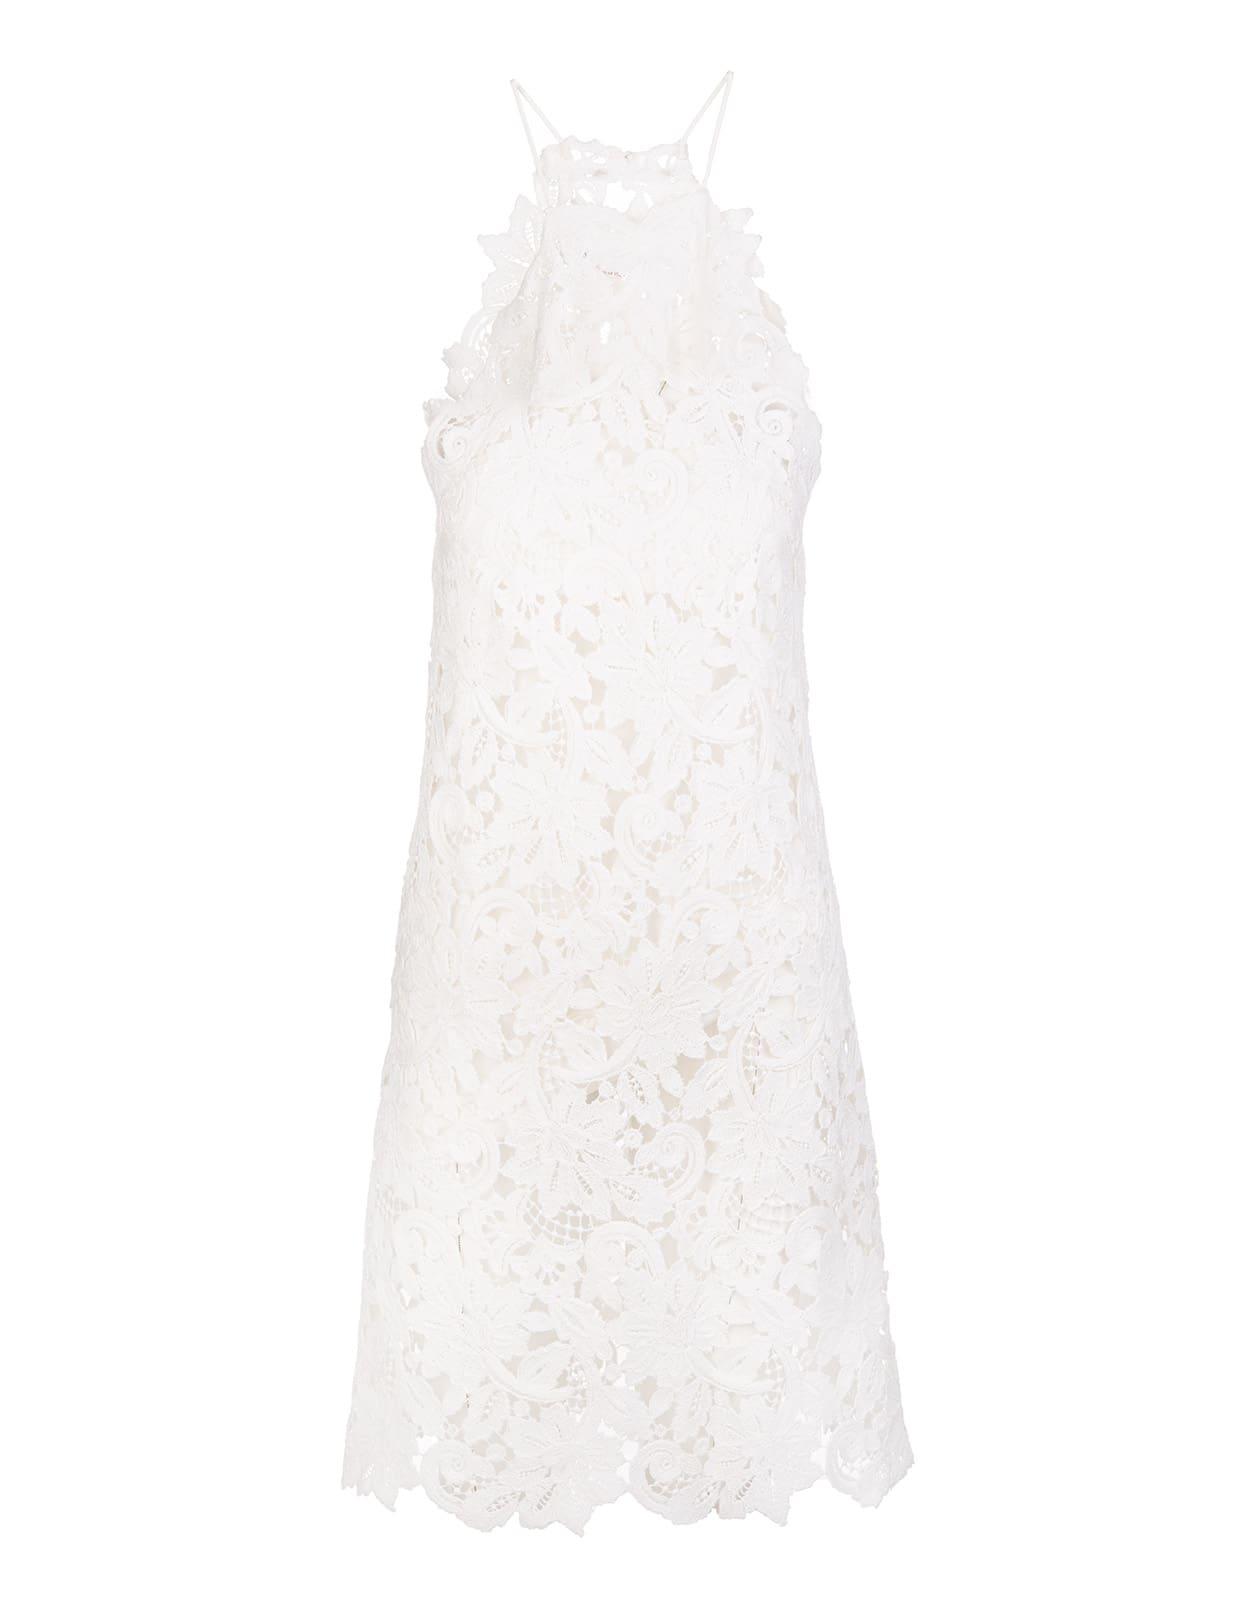 Ermanno Scervino Short Dress In White Lace With American Neckline